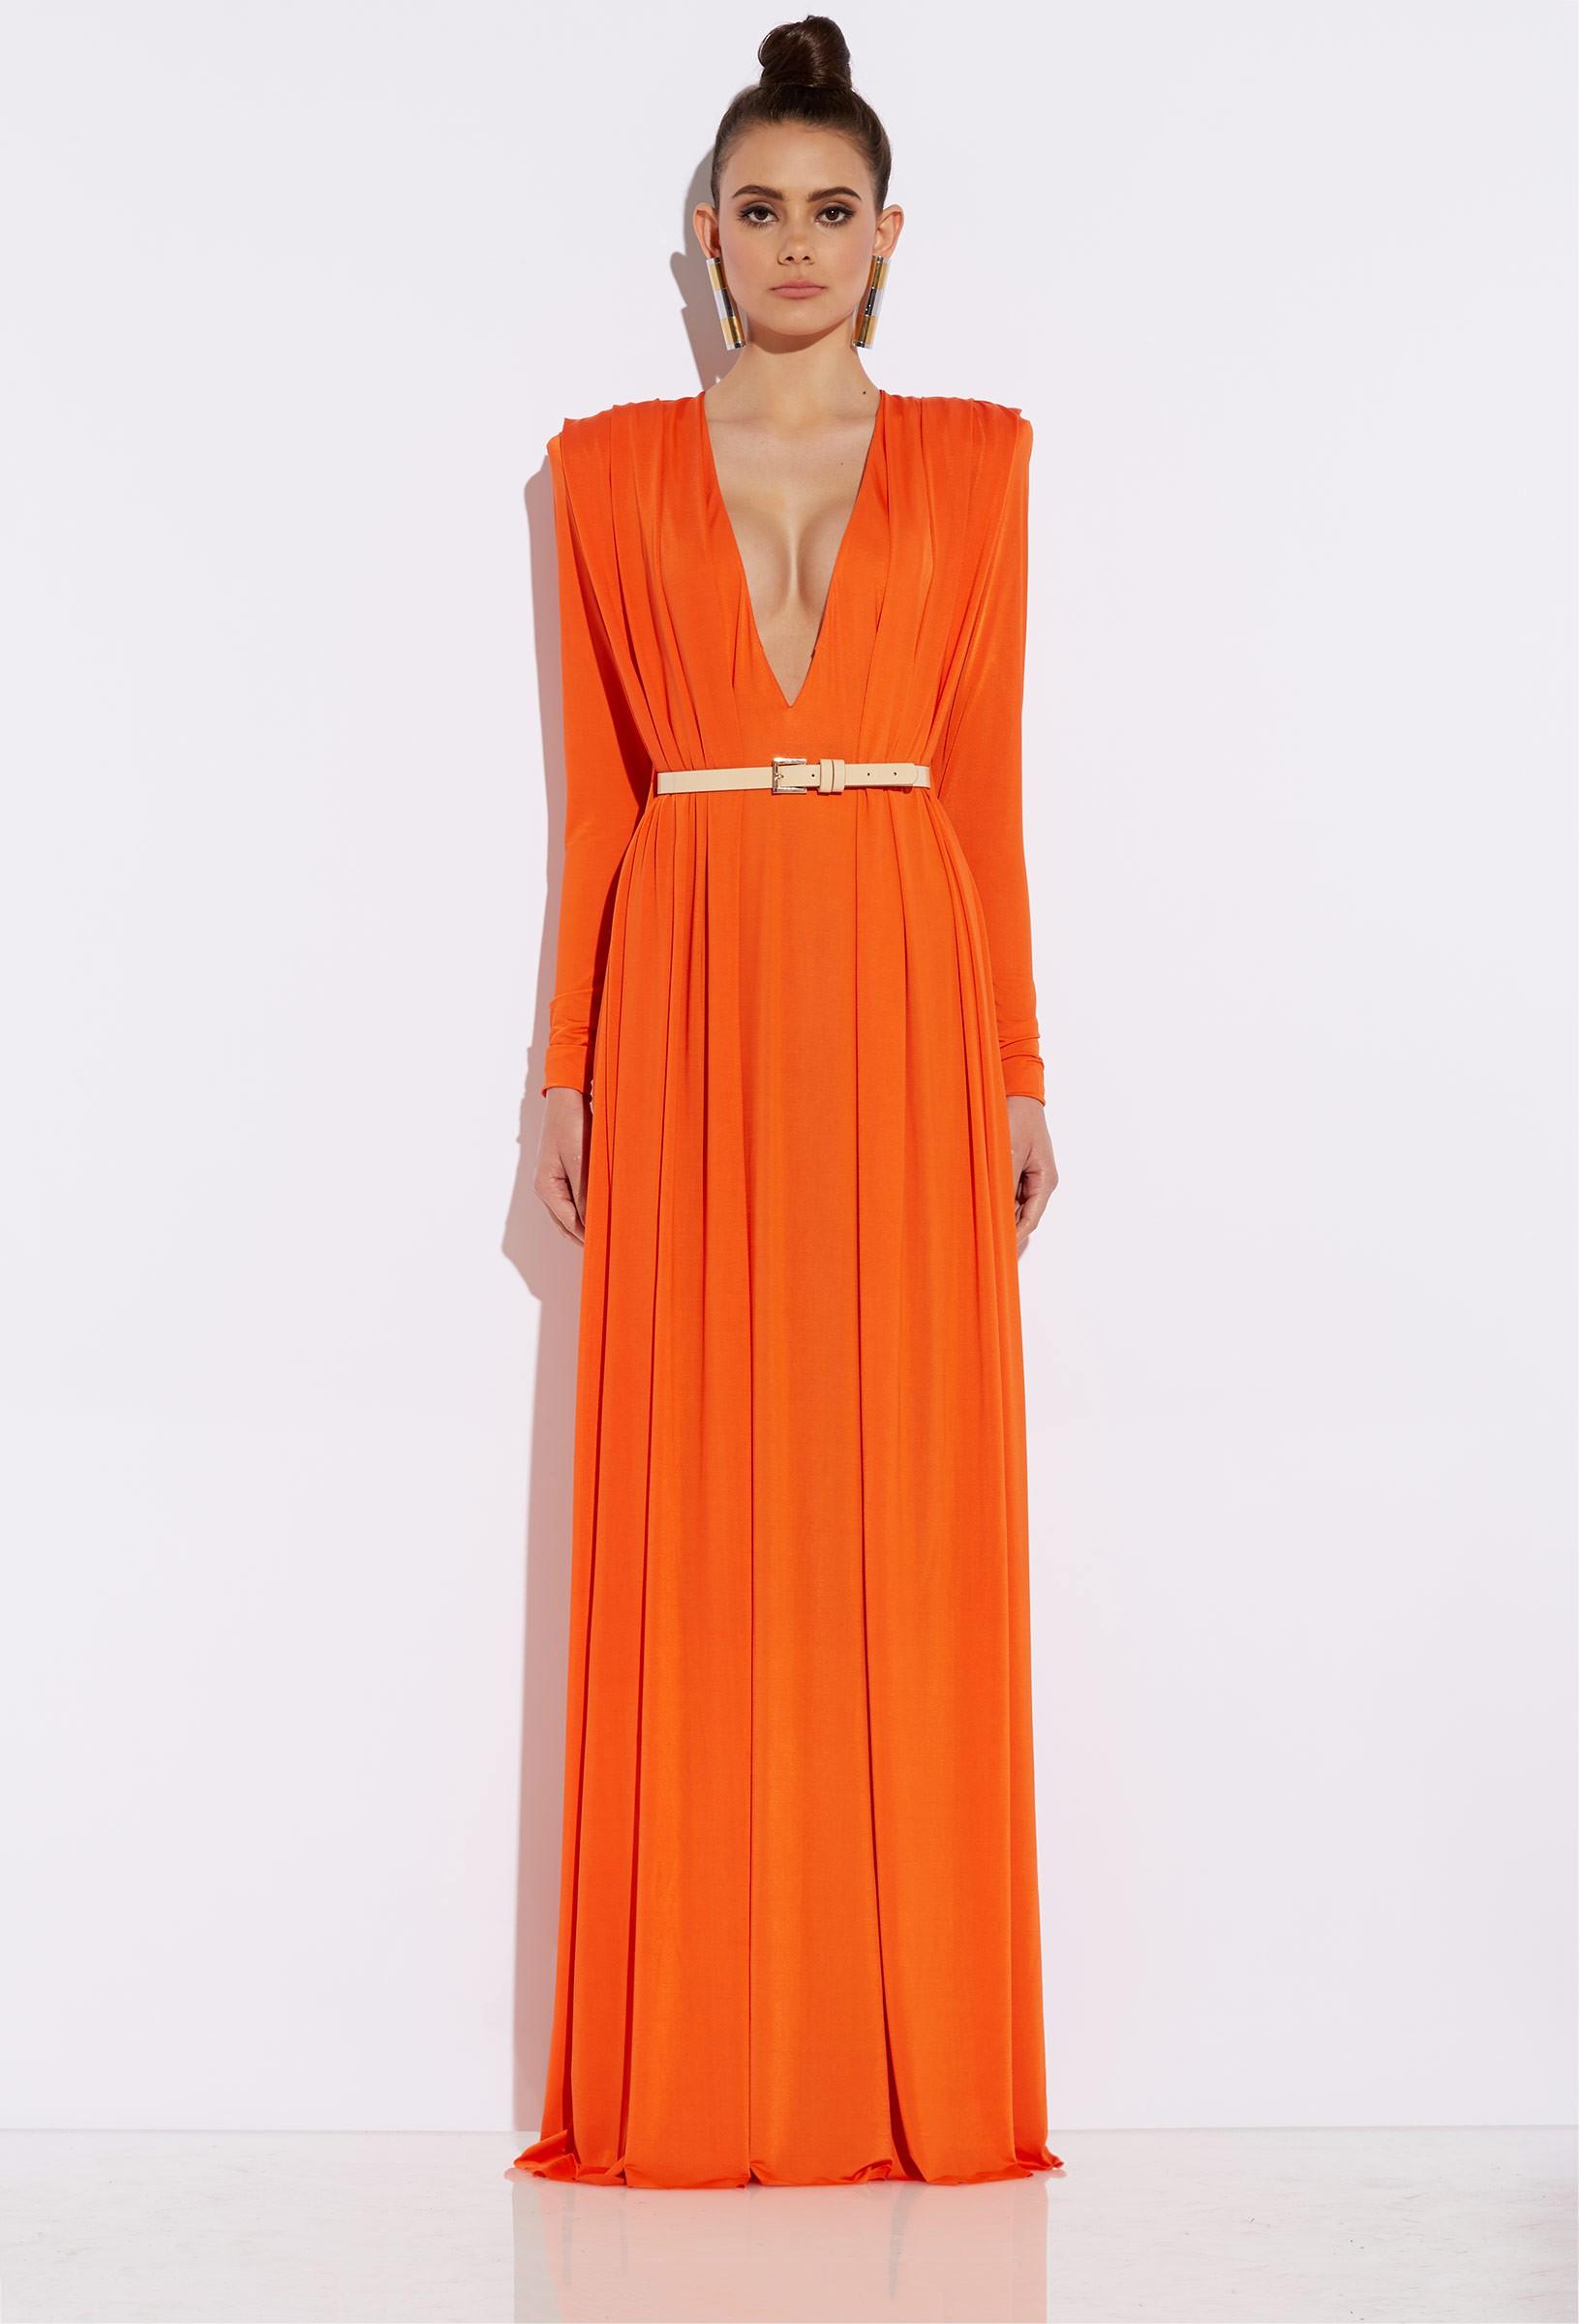 Bowie orange draped maxi dress